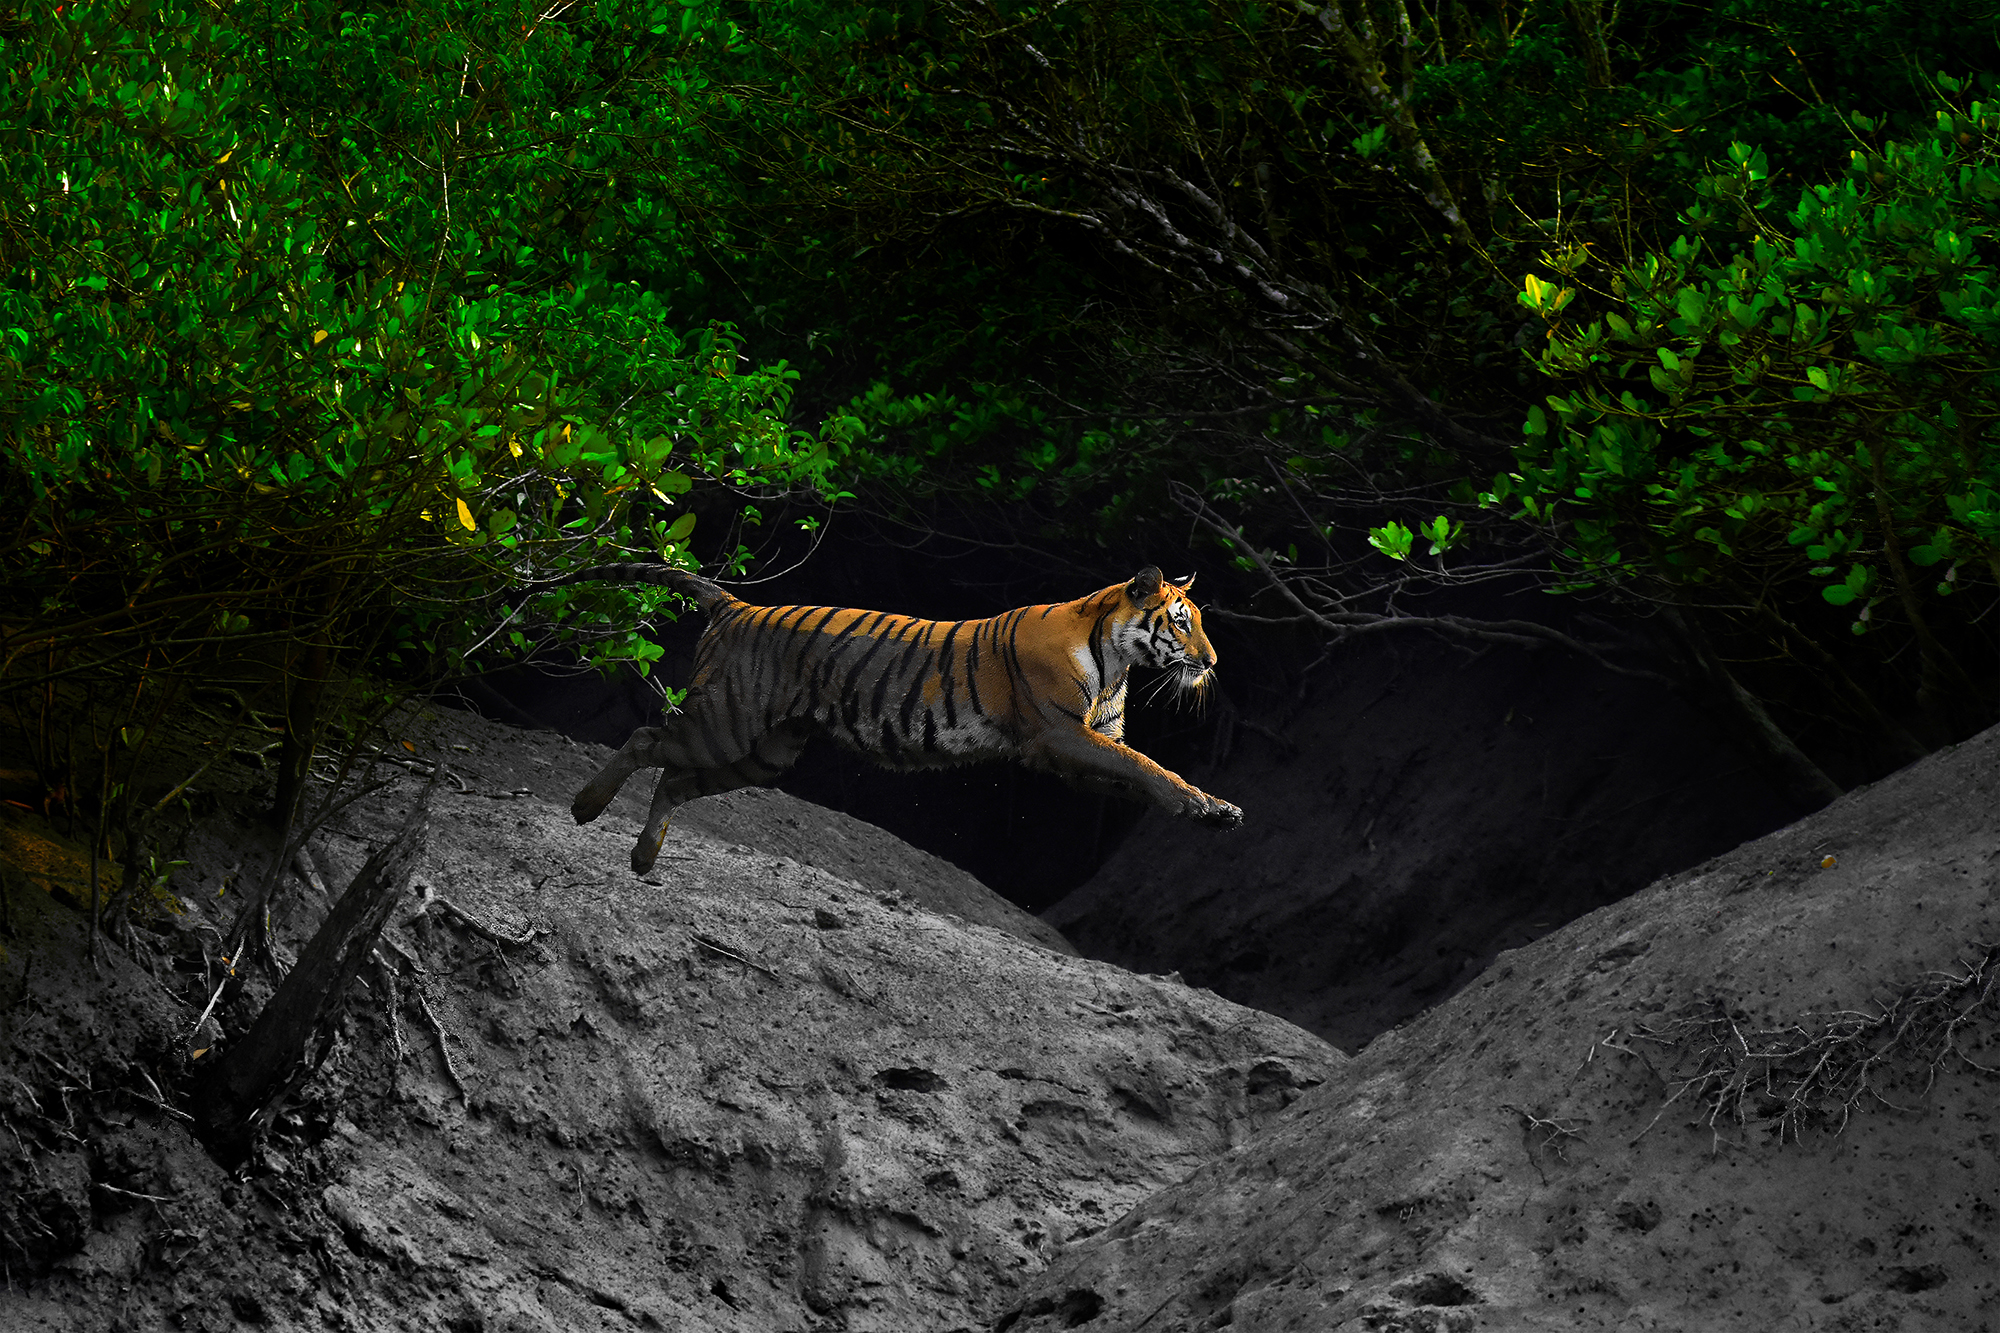 Adaptation of the Bengal Tiger – Arijit Das, India